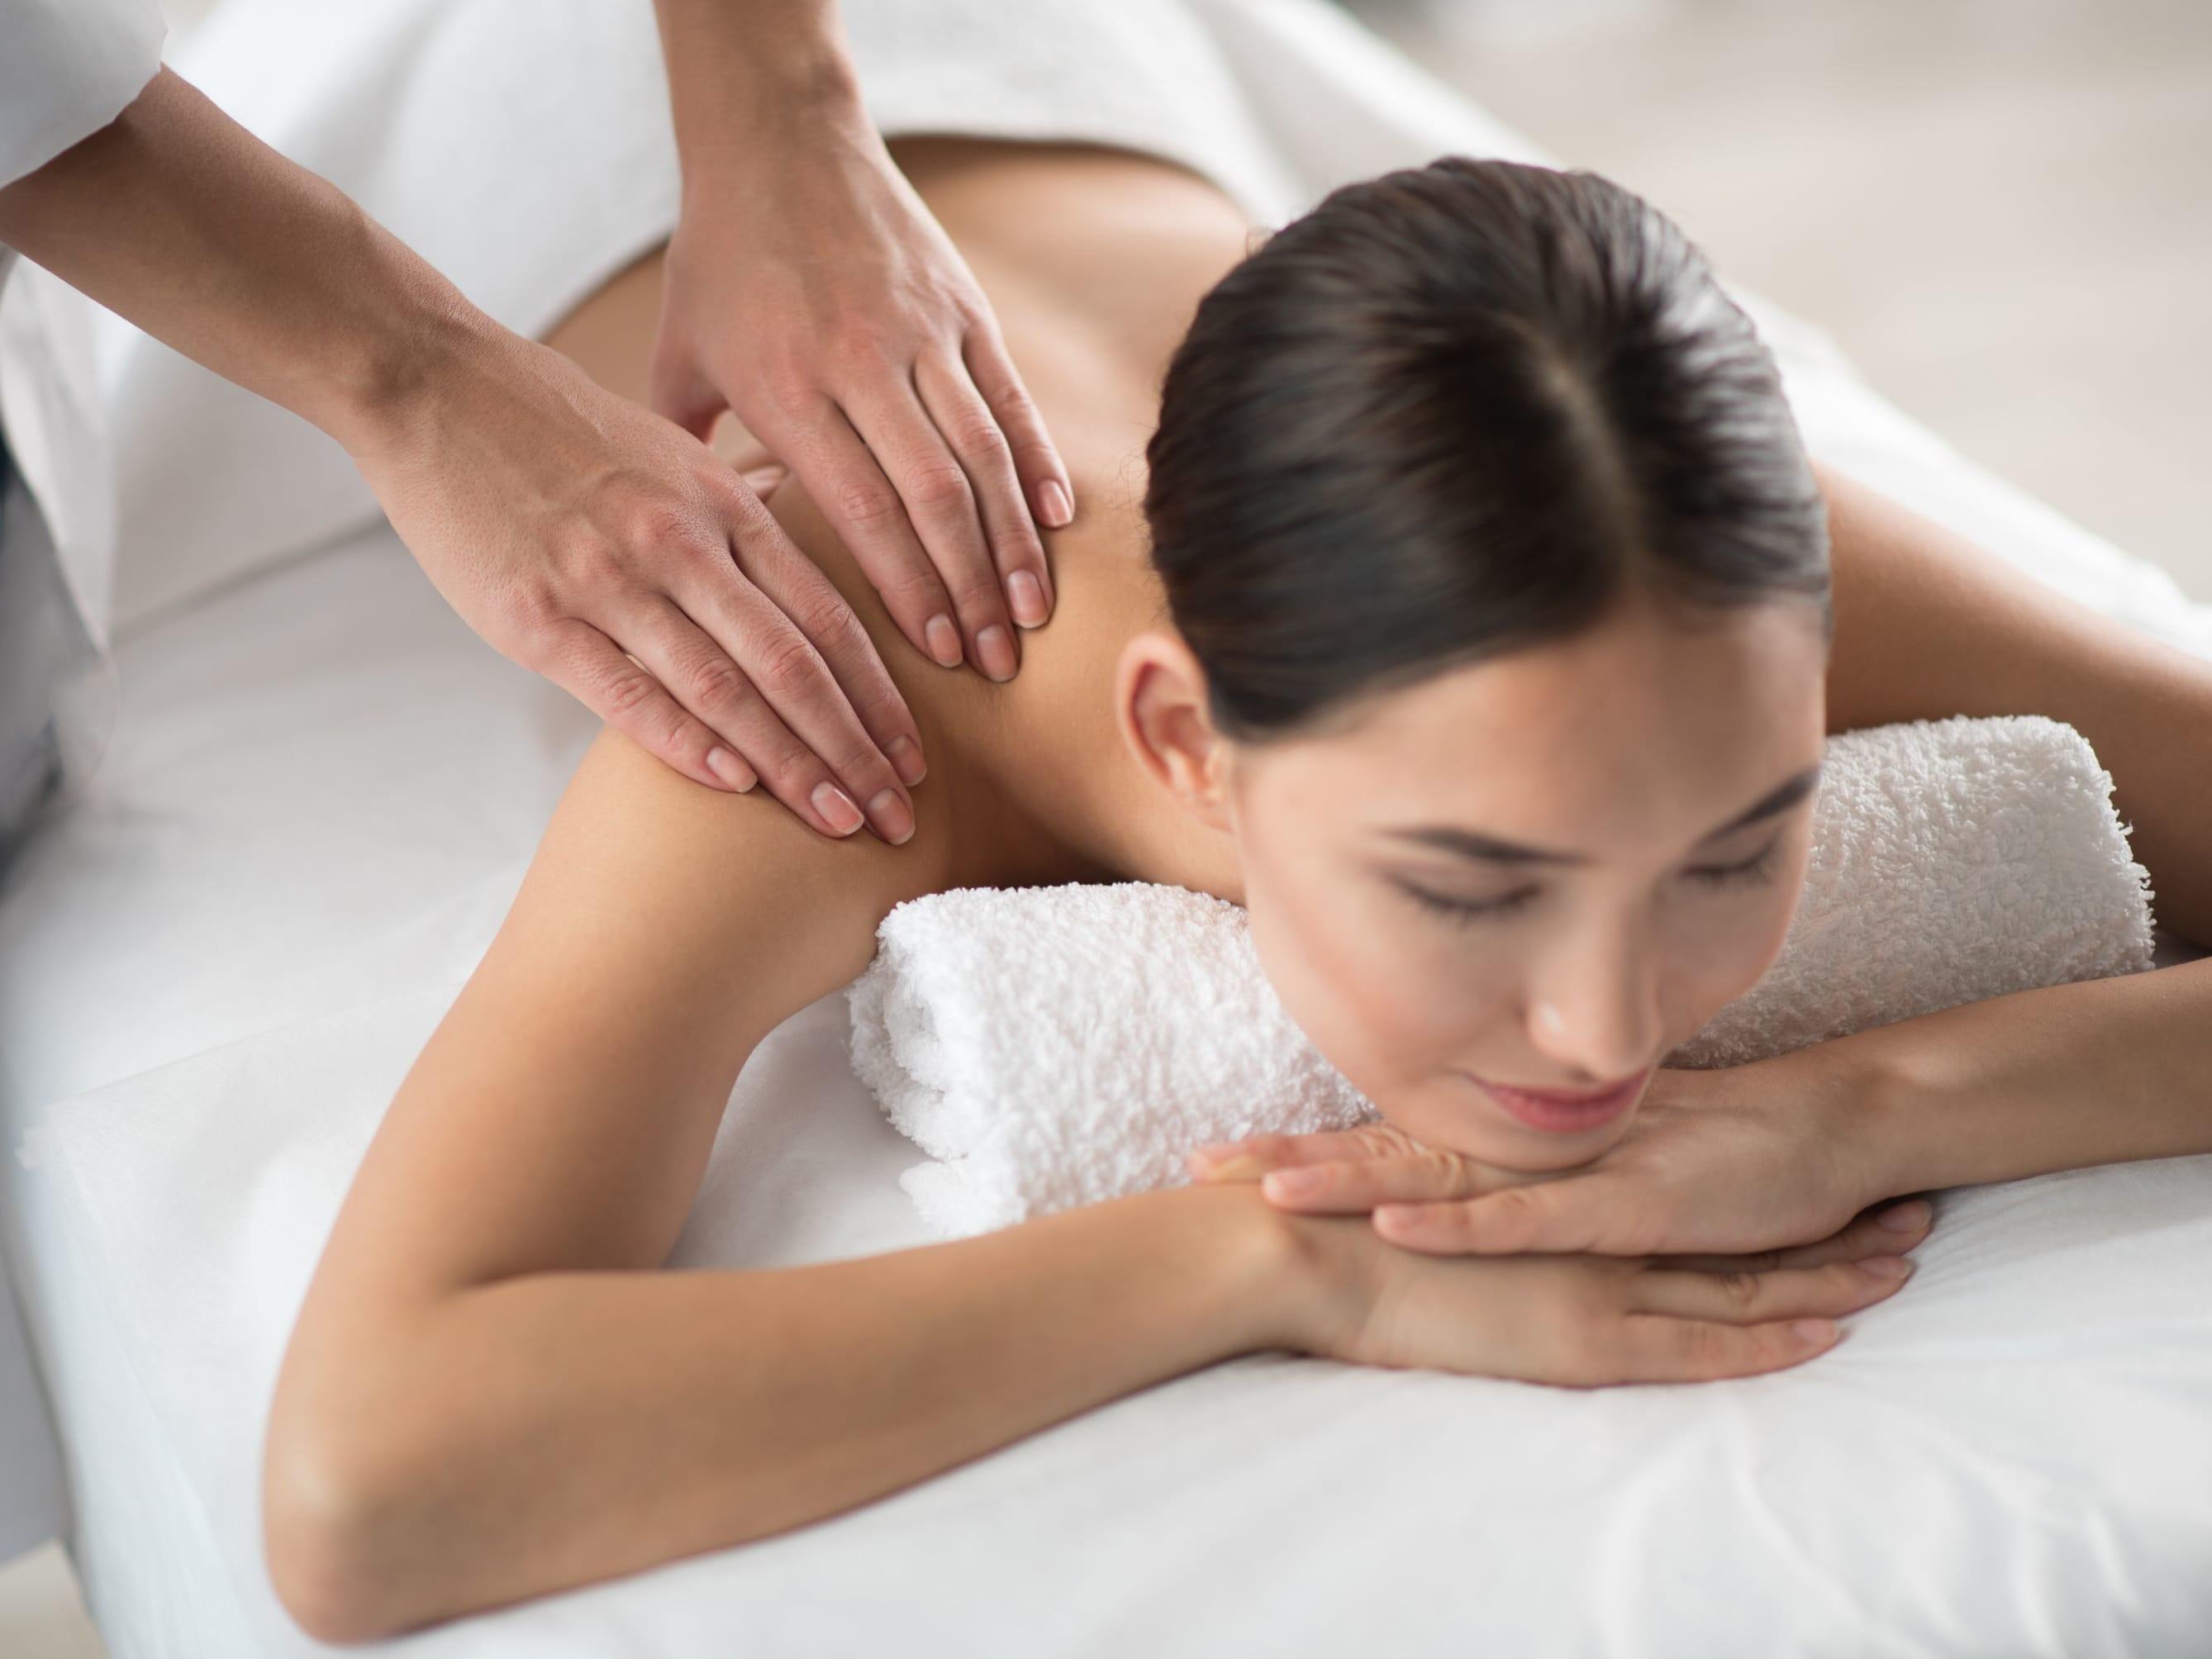 1.5-Hour Aroma Swedish Full Body Massage + Meridian Bo Jin Body Treatment for 1 Person